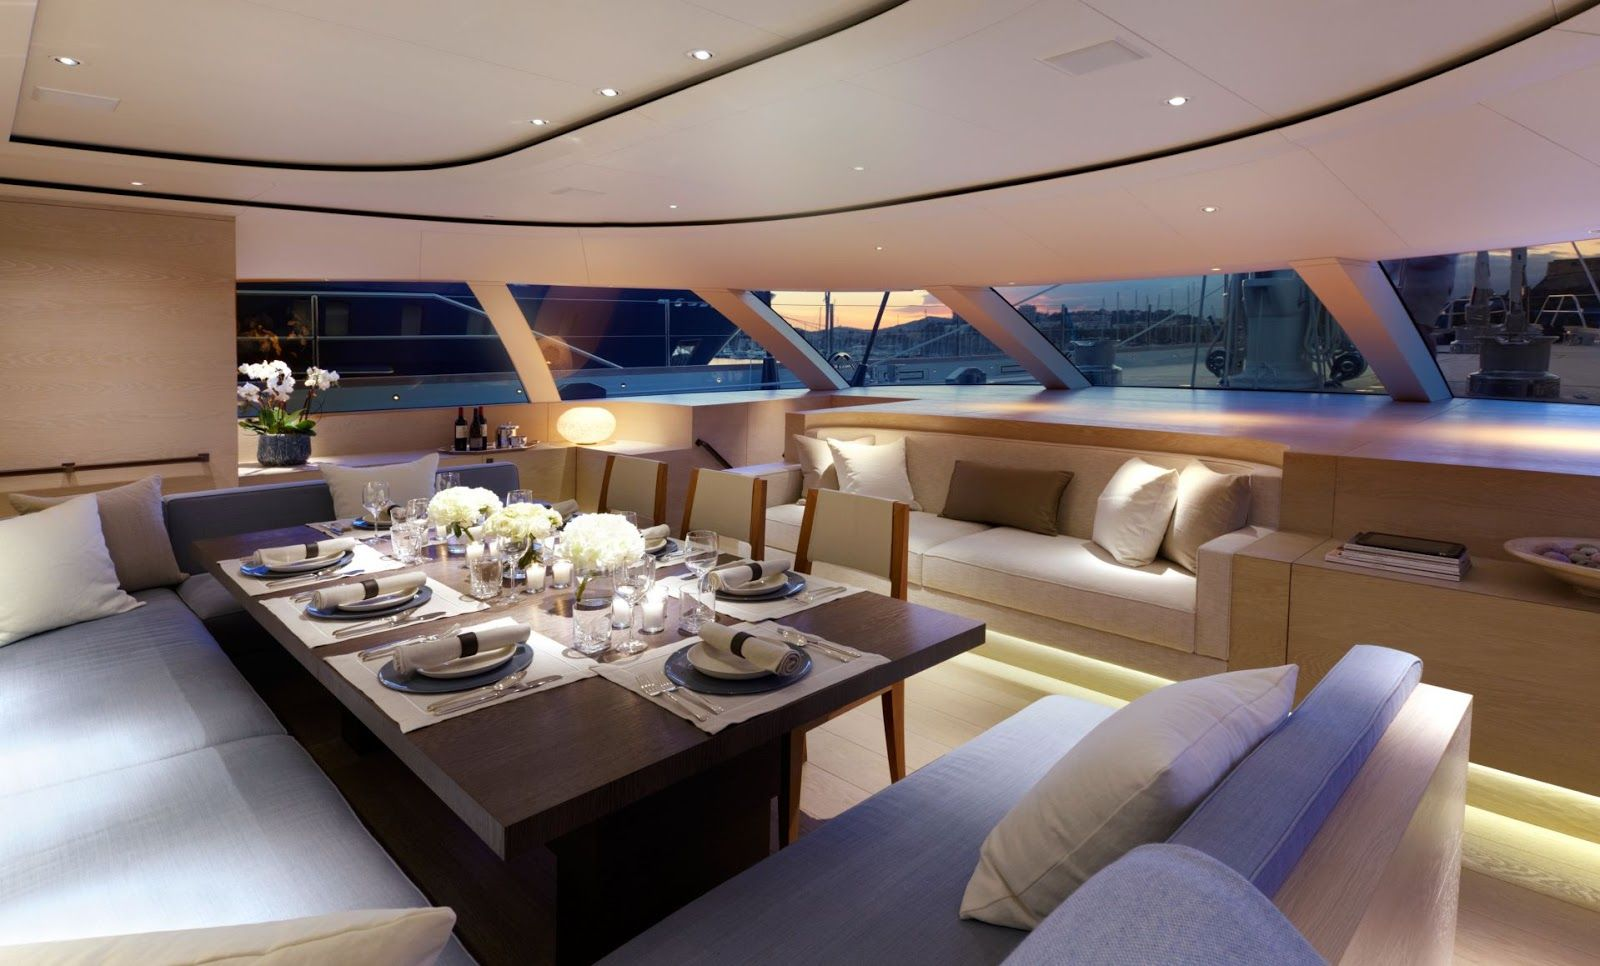 Luxury superyacht keyla interior by hot lab luxury yacht charter - Luxurious Interior Design Of A Sailing Yacht Luxury Boats Pinterest Luxury Yachts Luxury Yacht Interior And Luxury Boats